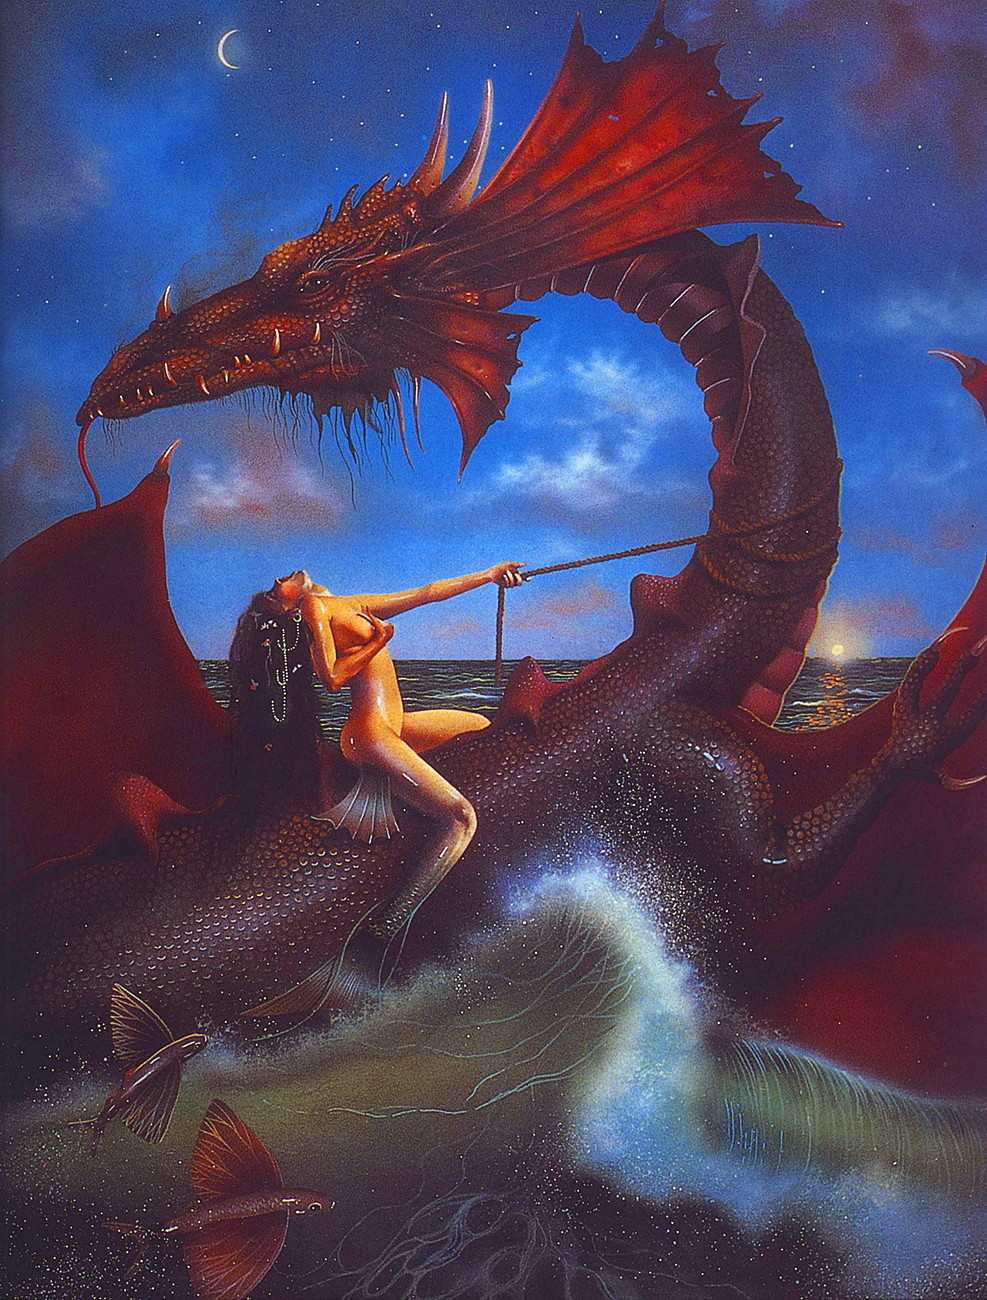 David Delamar. Return of the dragon